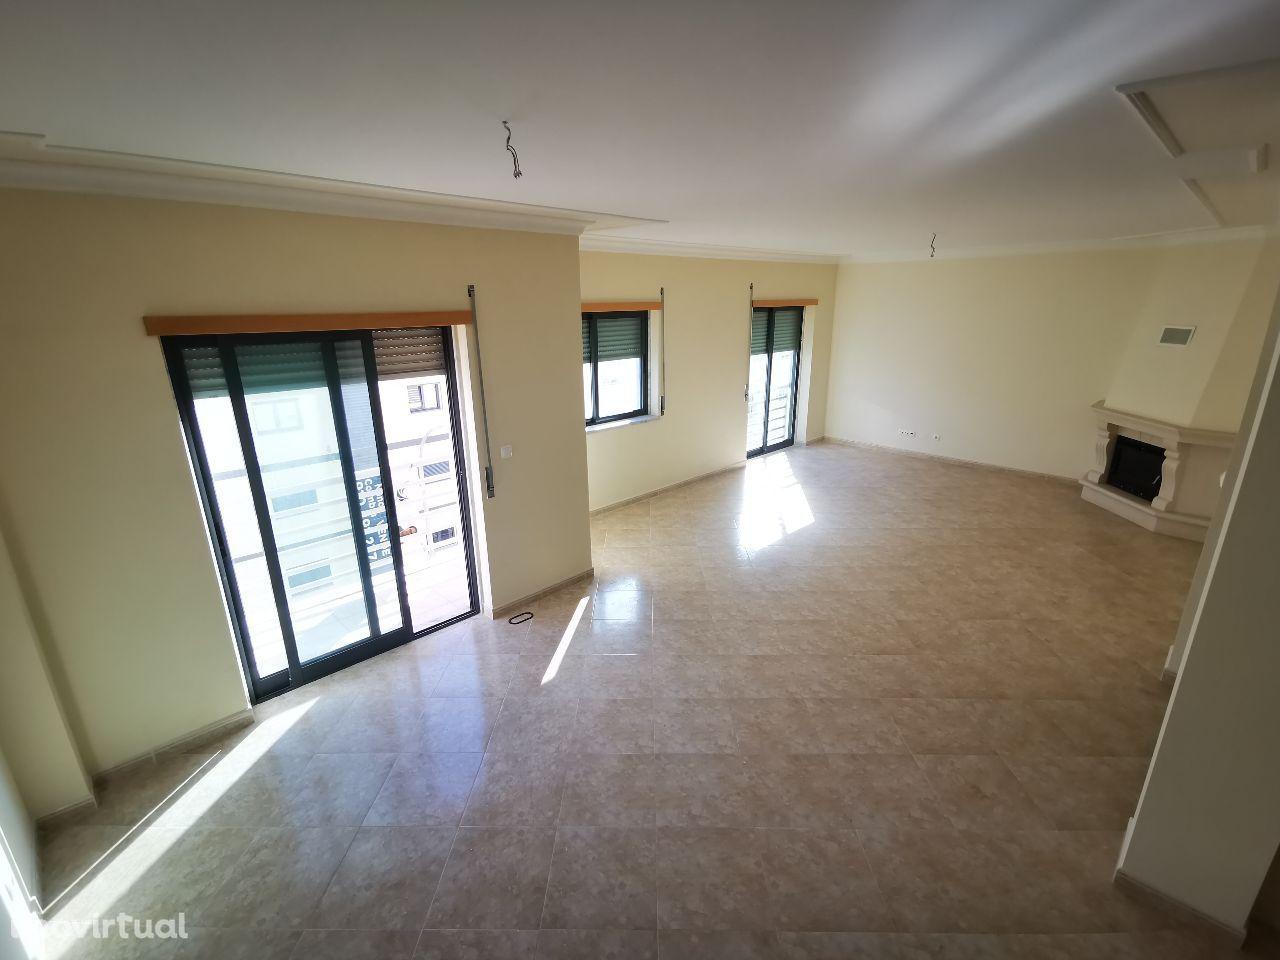 Excelente Apartamento T4 Duplex